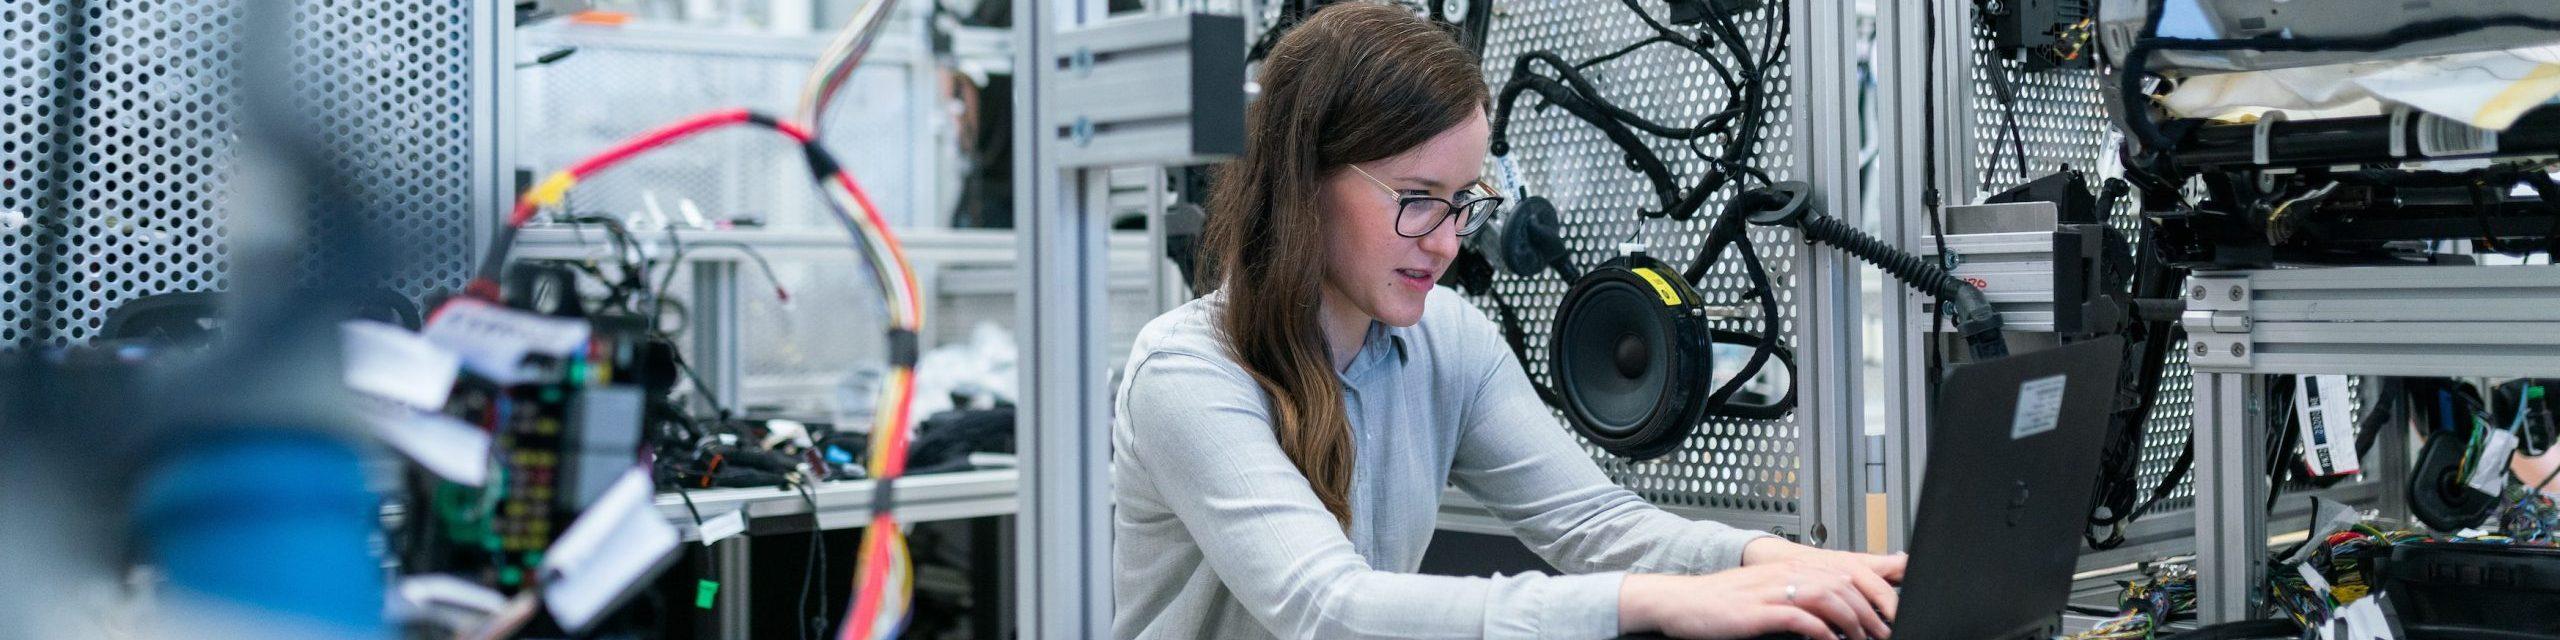 Female engineer works on computer